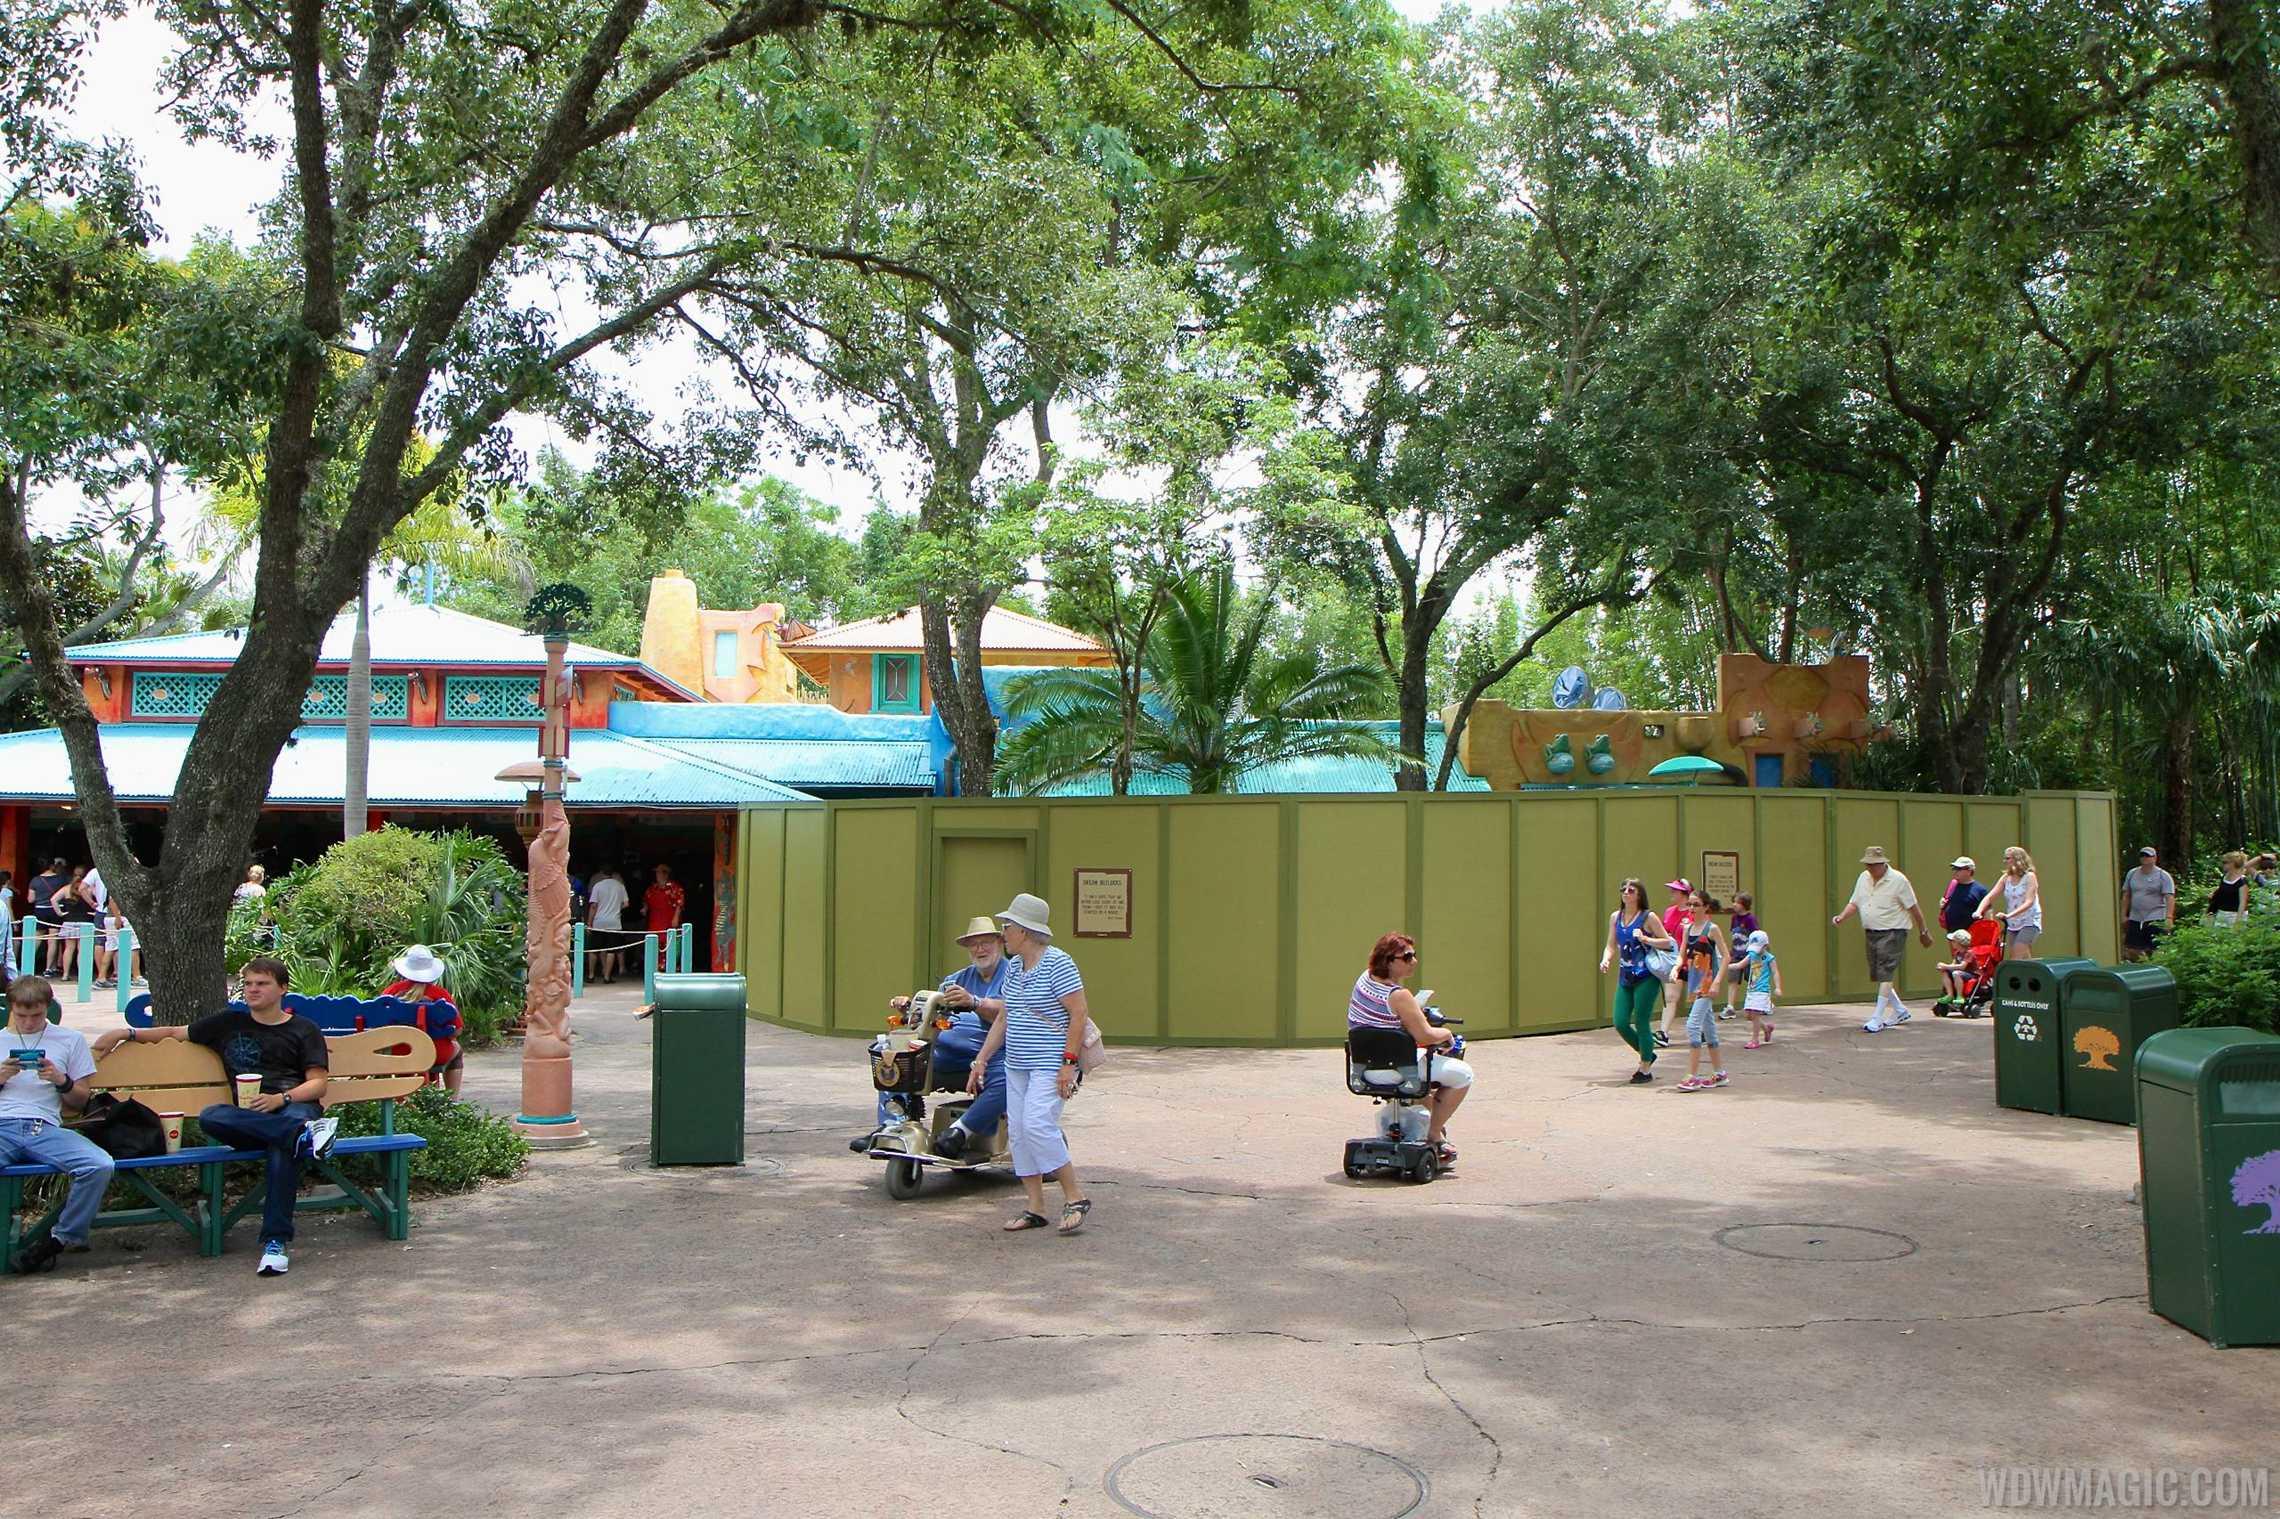 Coffee kiosk construction at Disney's Animal Kingdom